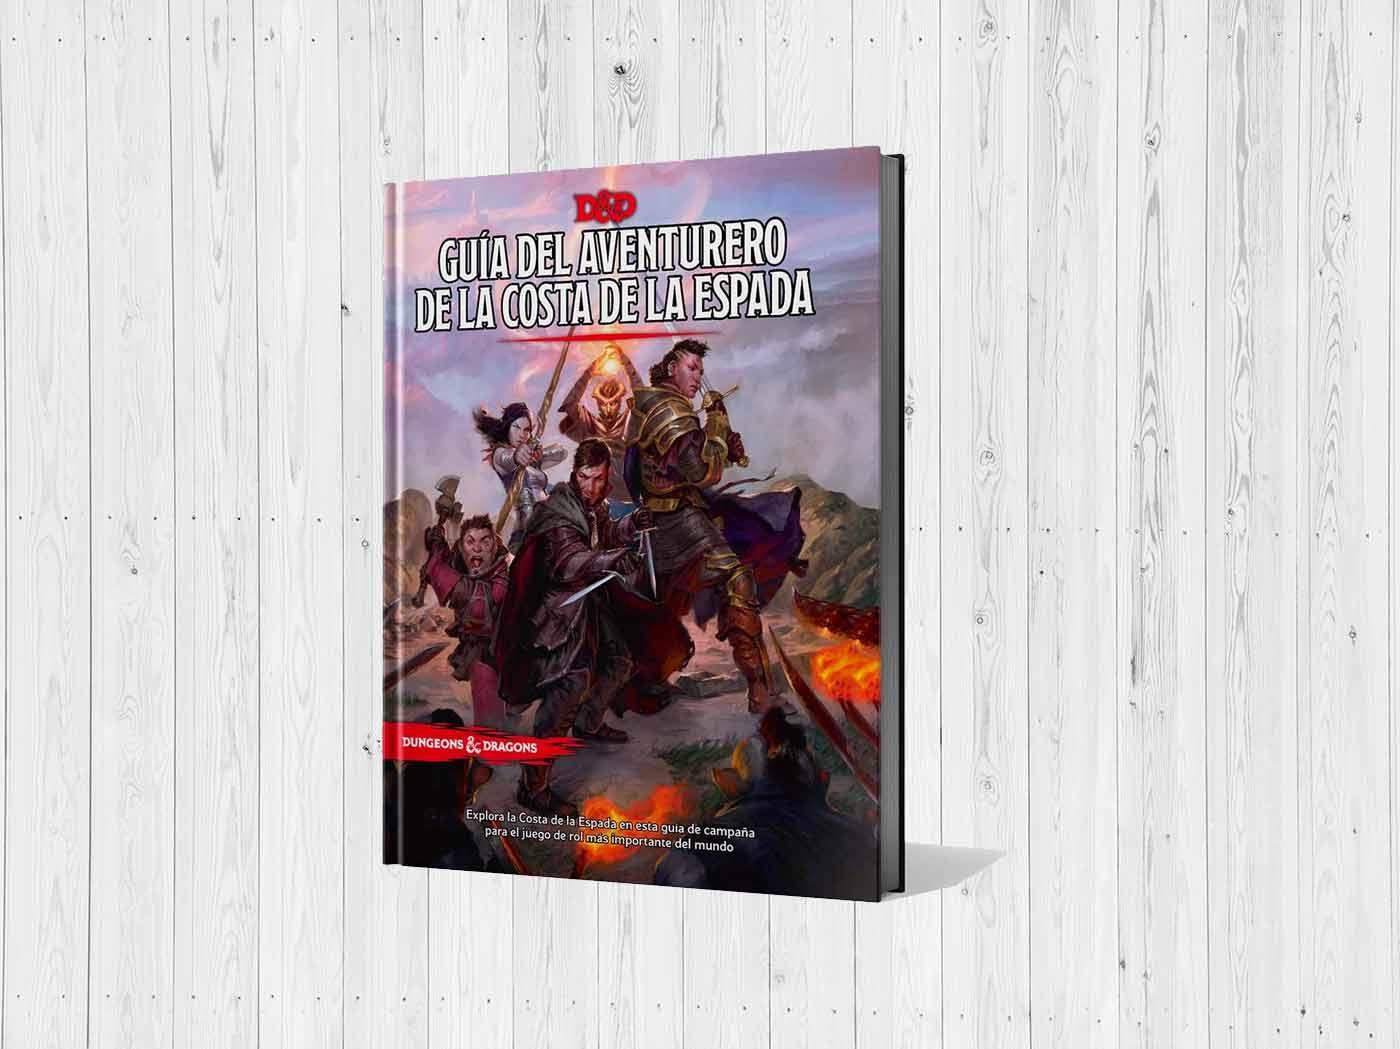 dungeon-dragon-guia-aventurero-costa-espada